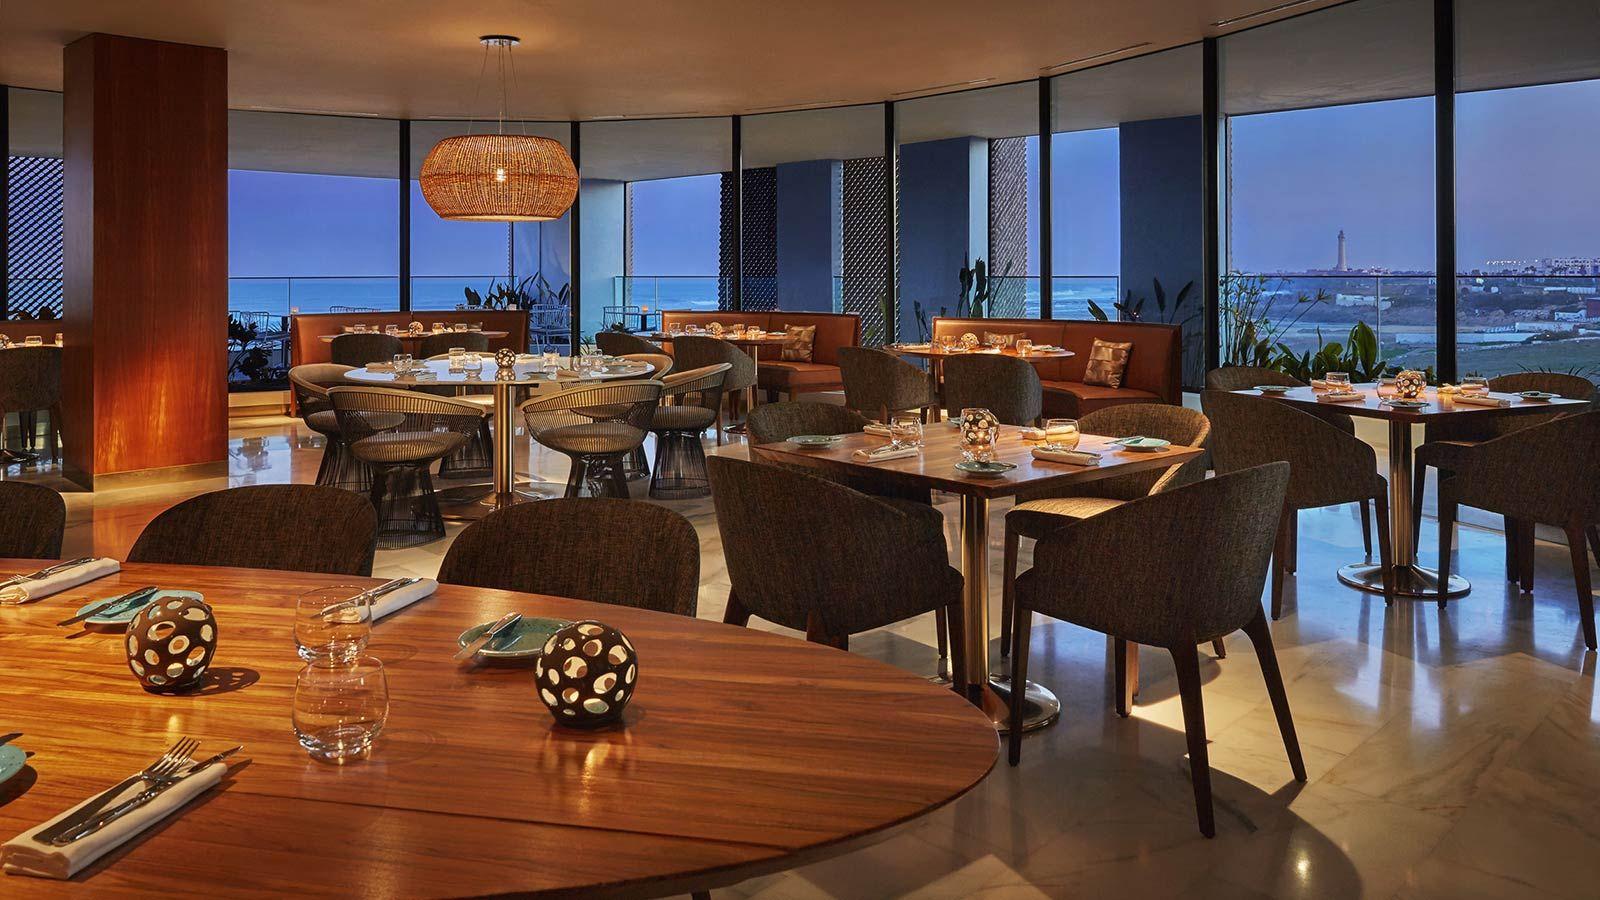 Casablanca Four Seasons Hotel, Modern Sea View Restaurant - Mace Group